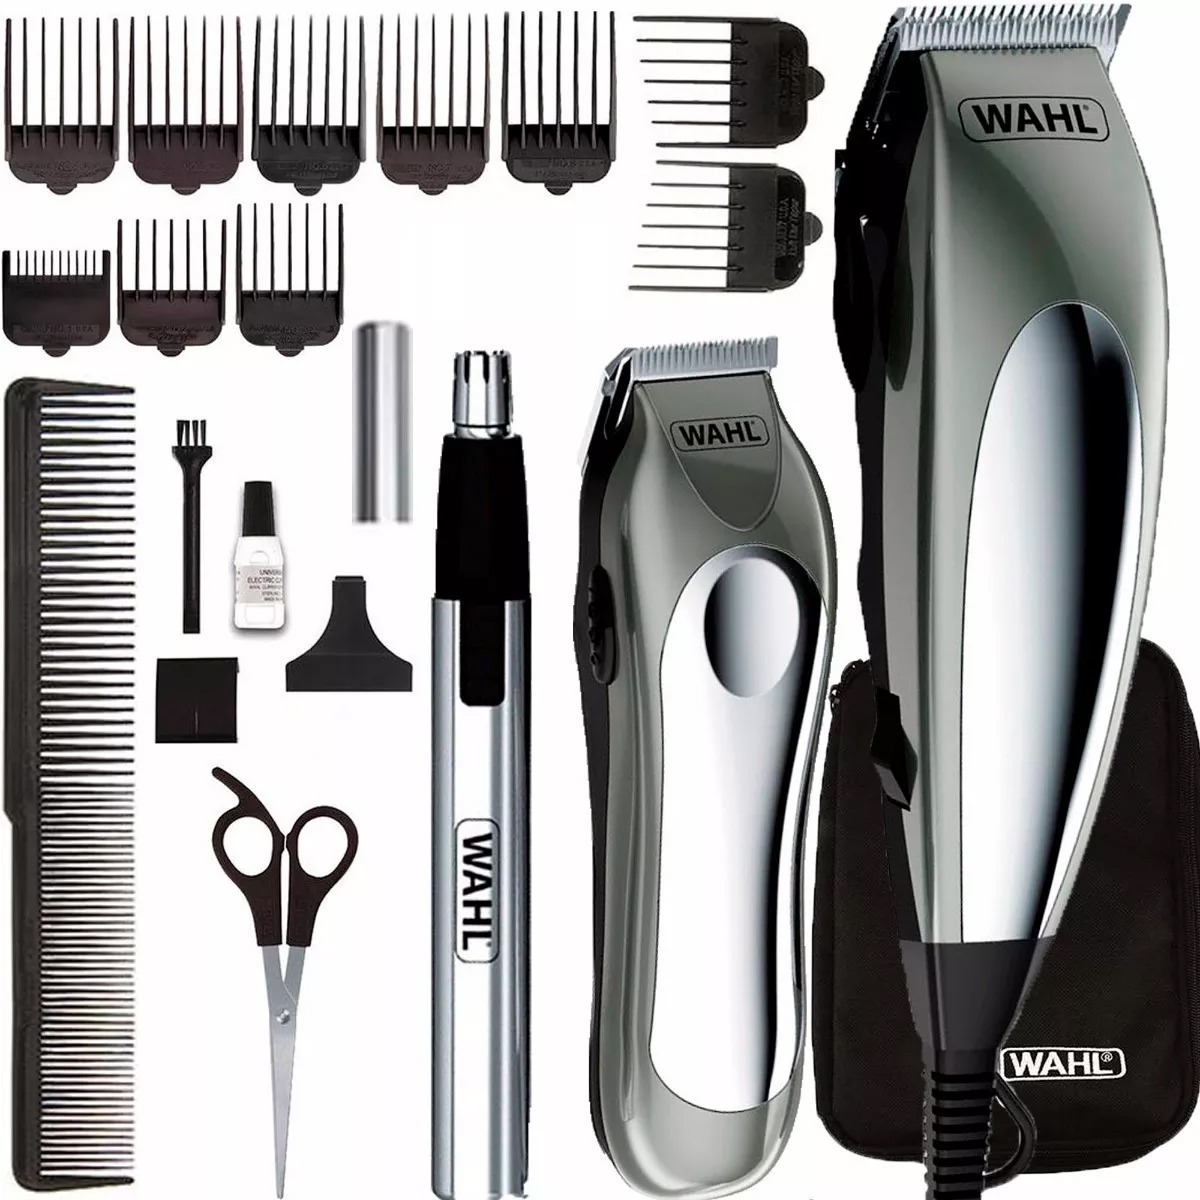 060824493 máquina cortar cabelo wahl deluxe groom pro completa. Carregando zoom. Kit  Masculino Maquina ...